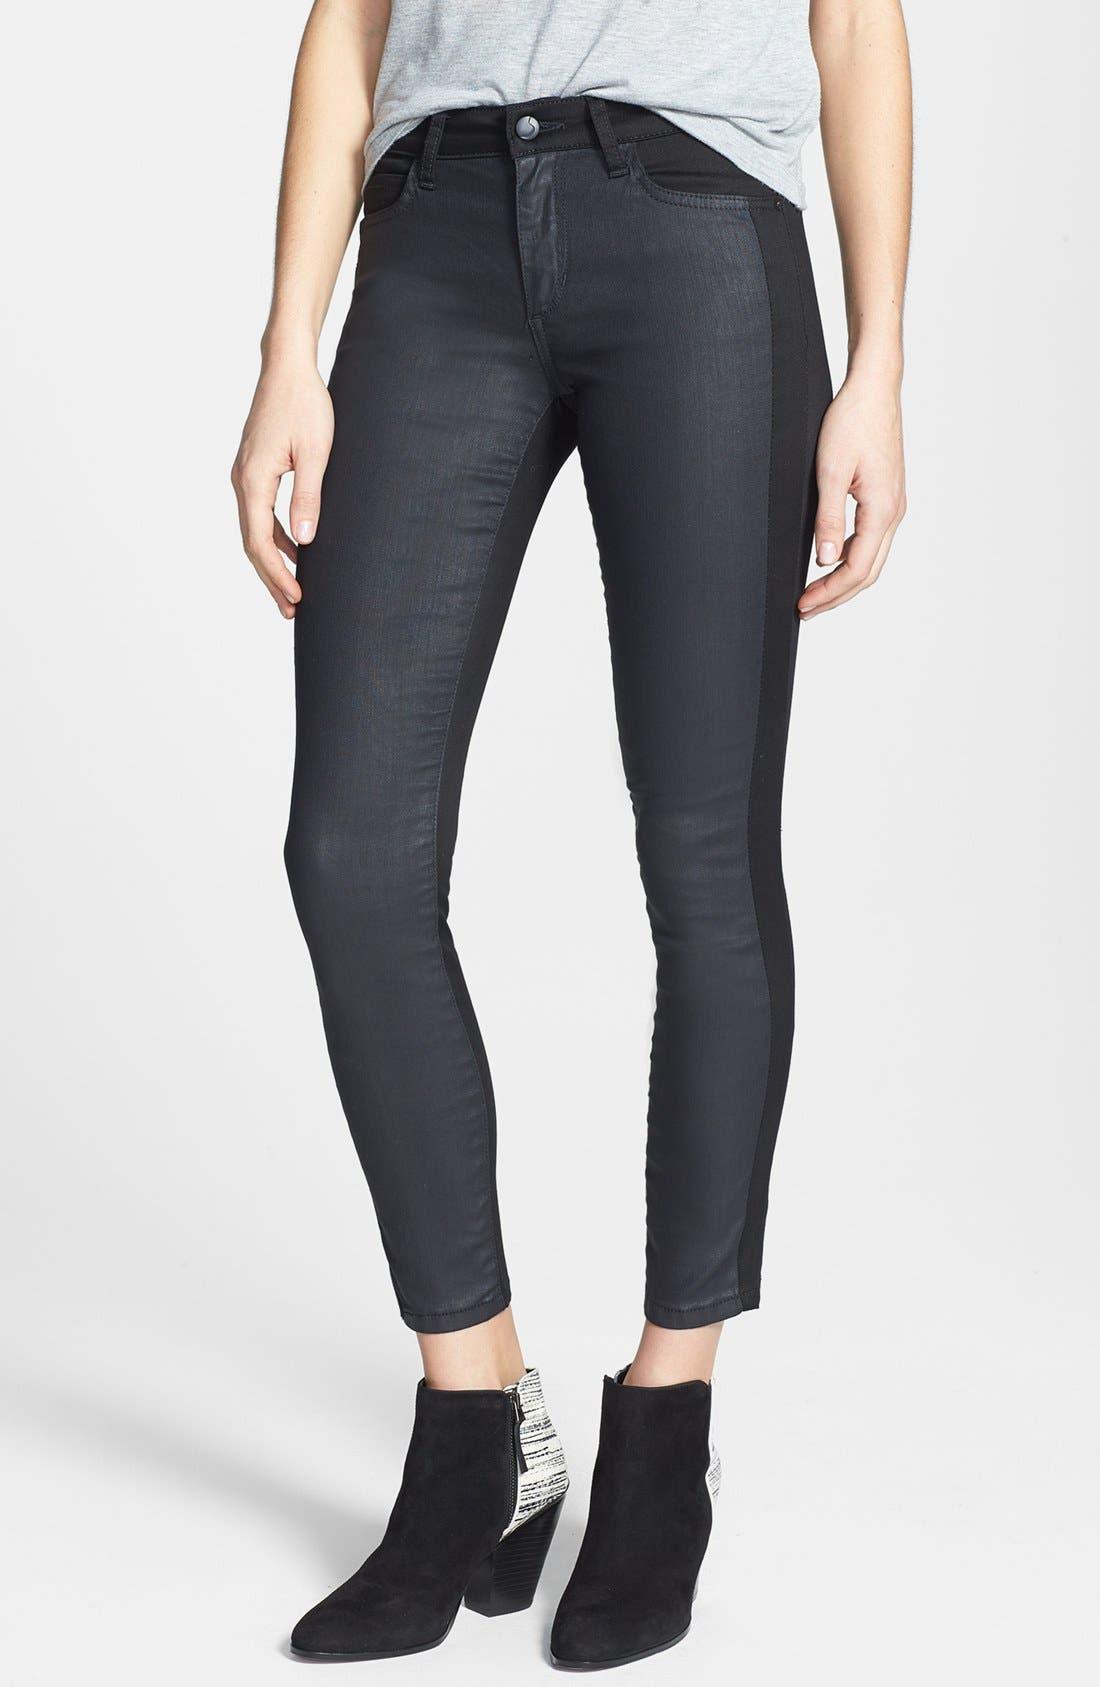 Main Image - Joe's 'The Oblique' Contrast Panel Crop Skinny Jeans (Kathy)